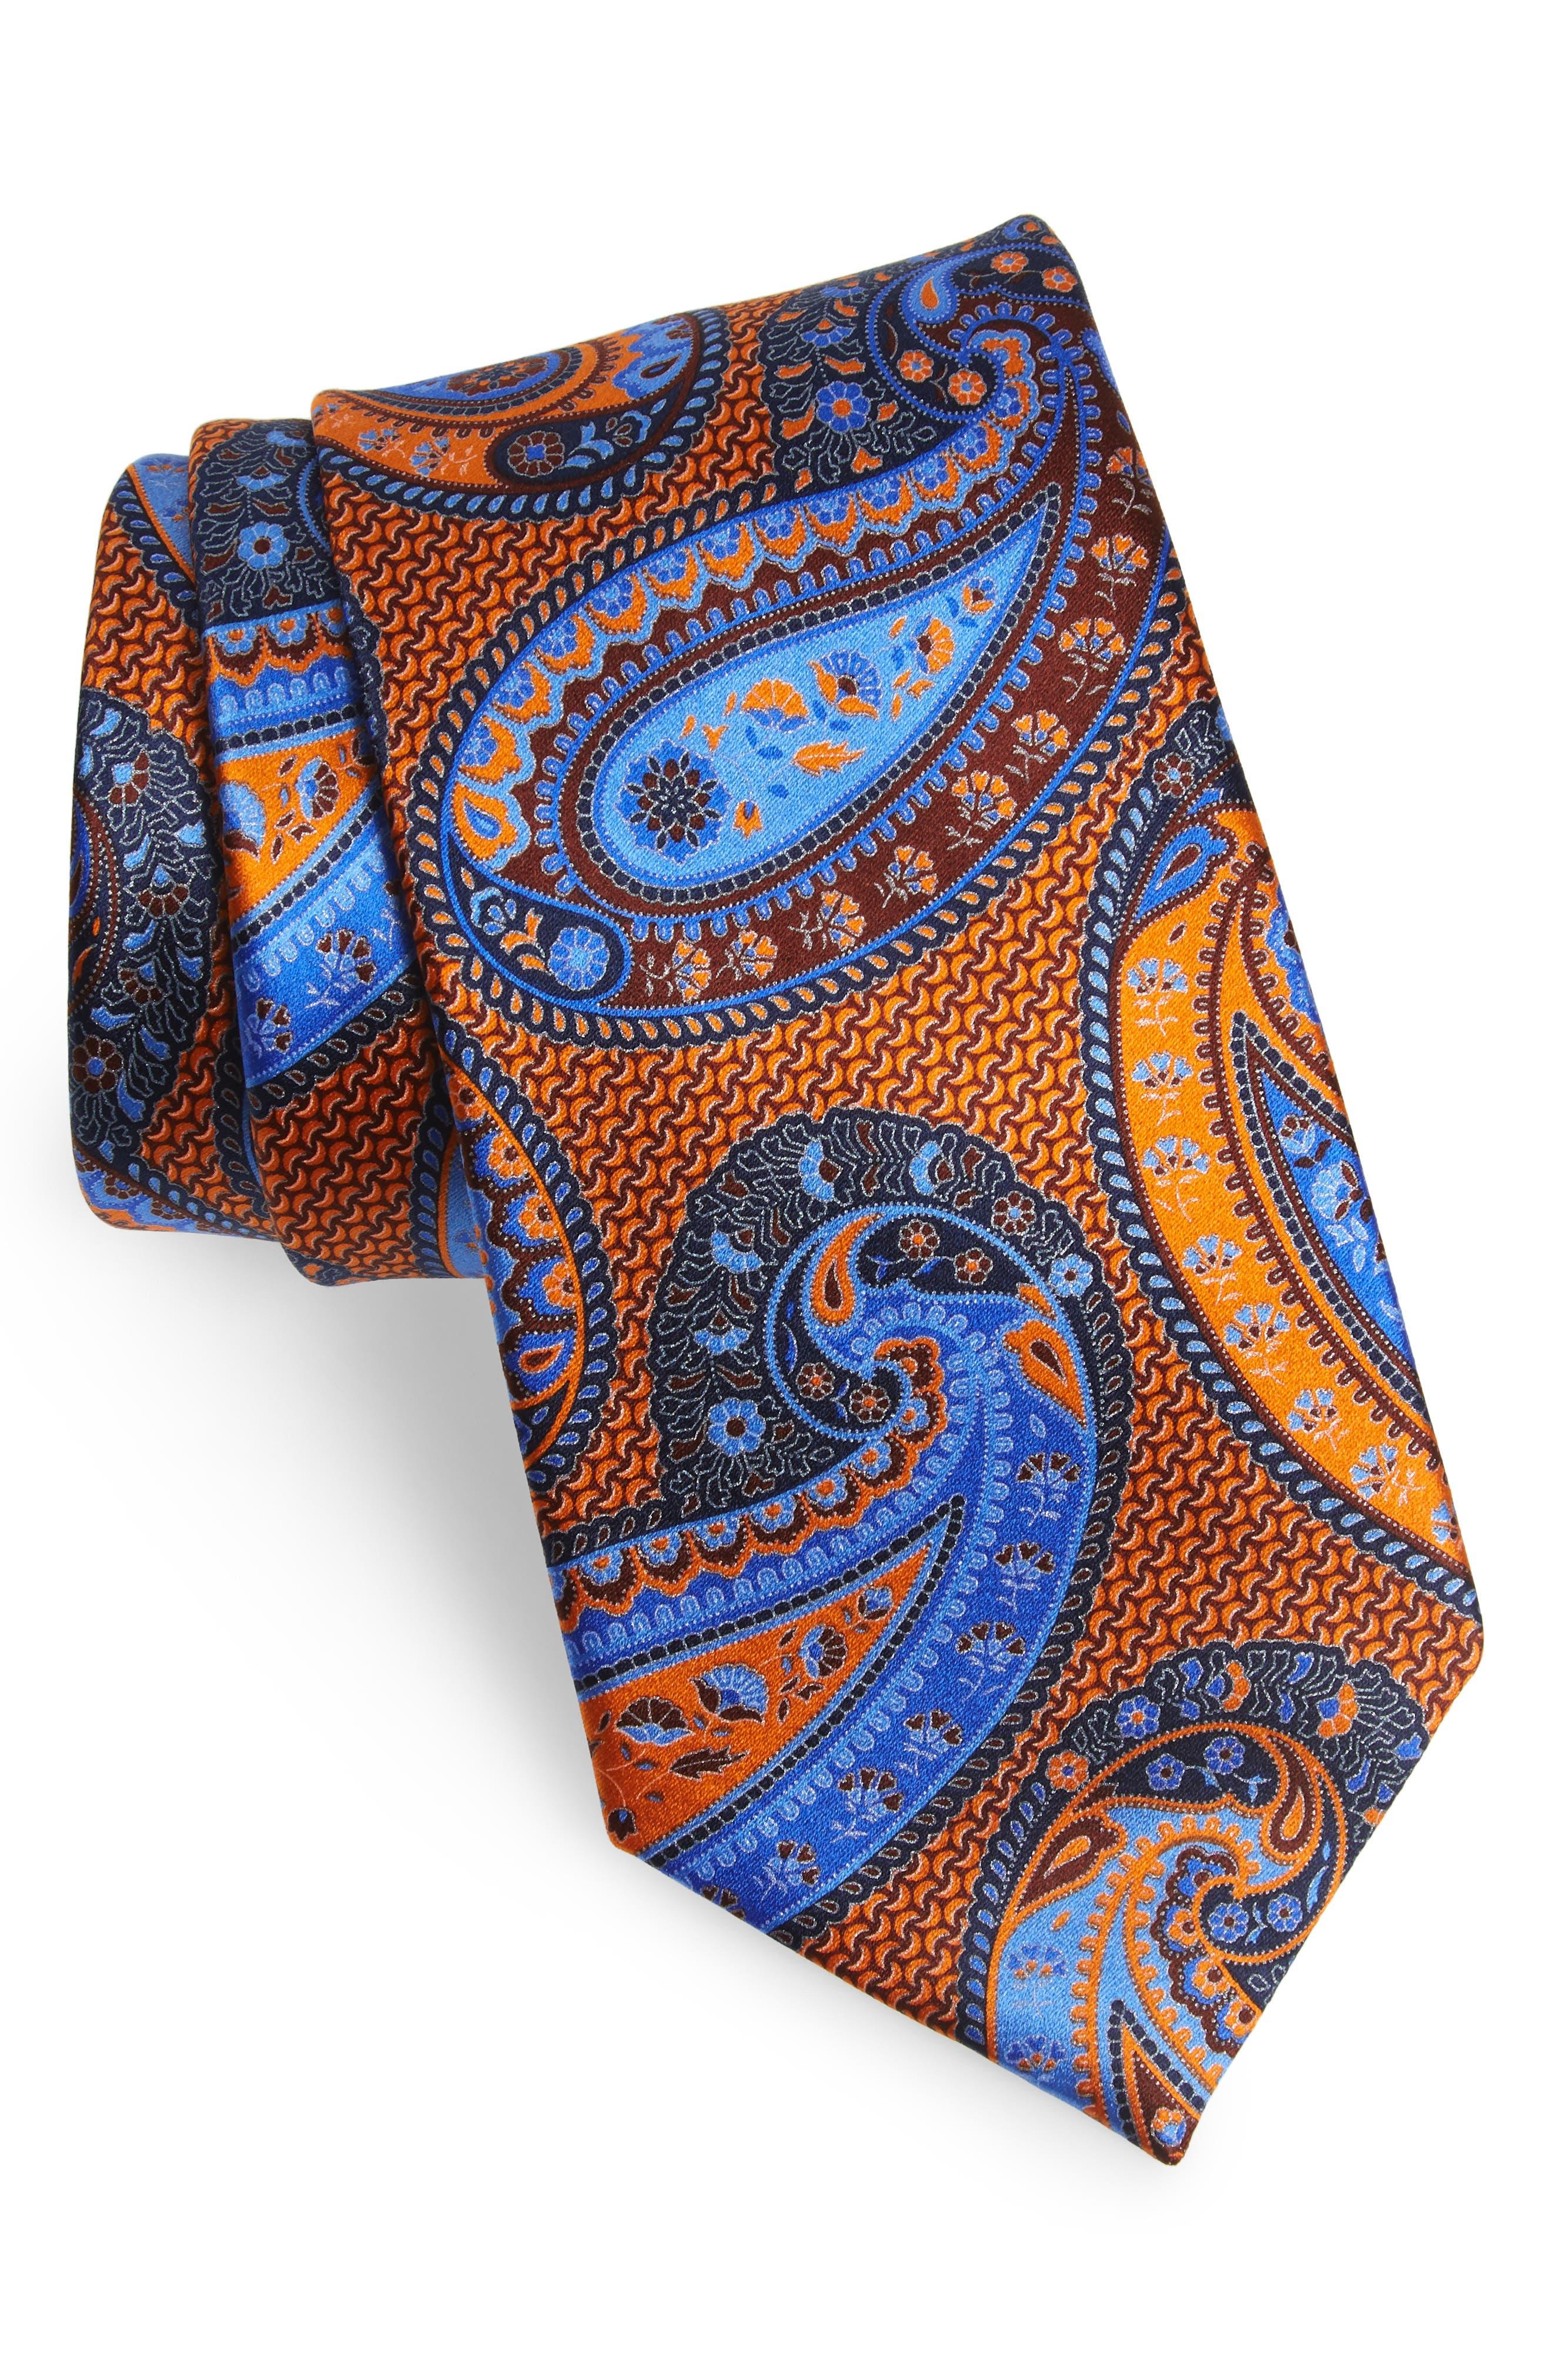 ERMENEGILDO ZEGNA, Paisley Silk Tie, Main thumbnail 1, color, ORANGE